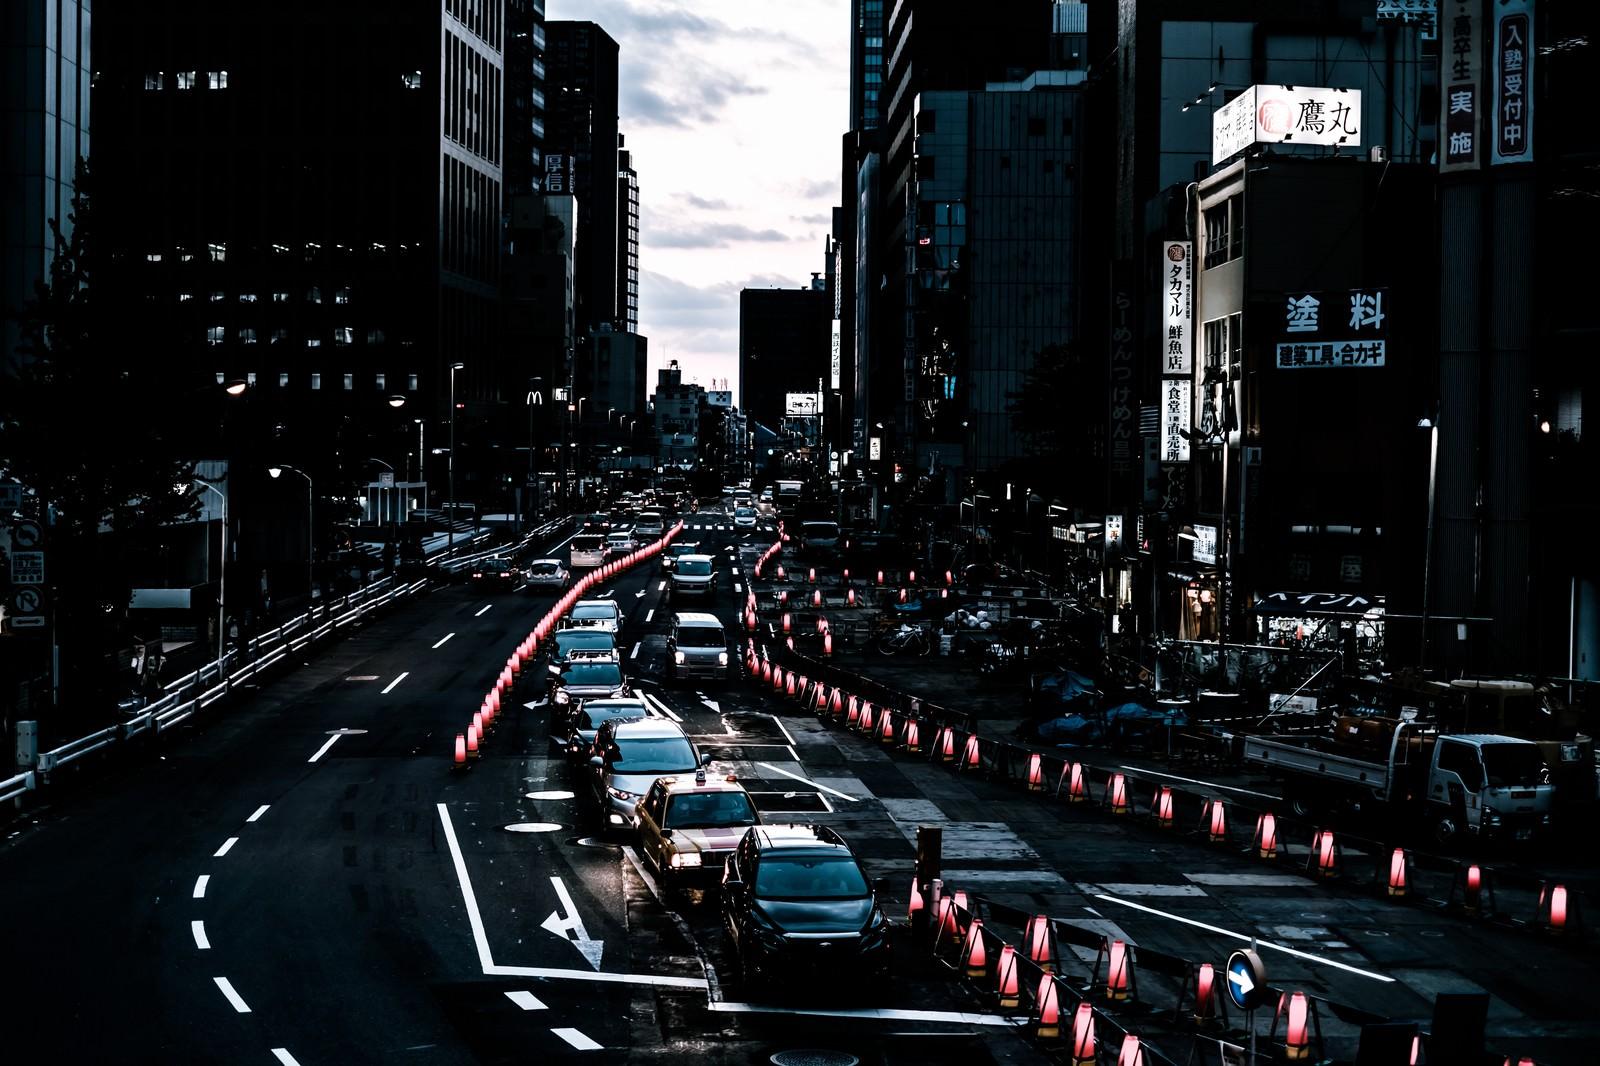 「新宿新都心歩道橋下前の道路工事」の写真